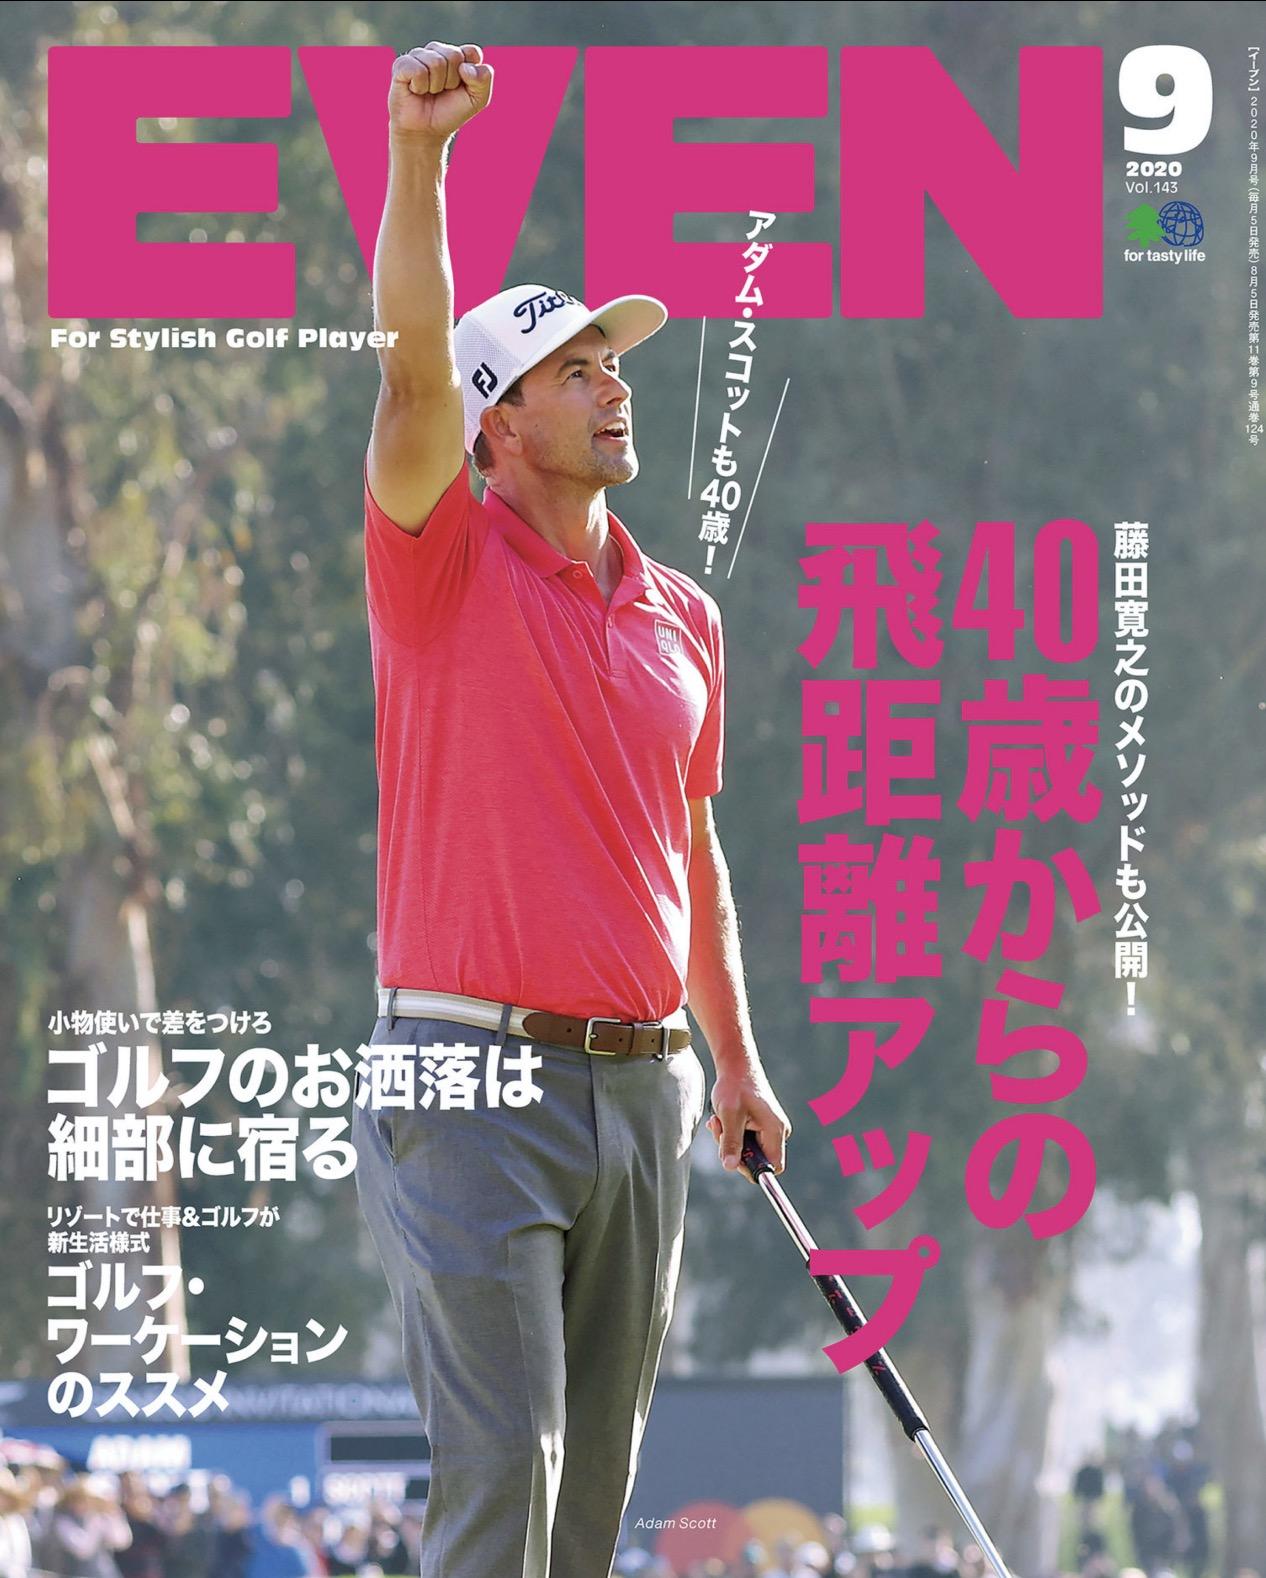 EVEN(イーブン)2020年9月号掲載 ゴルフとワーケーションの良い関係